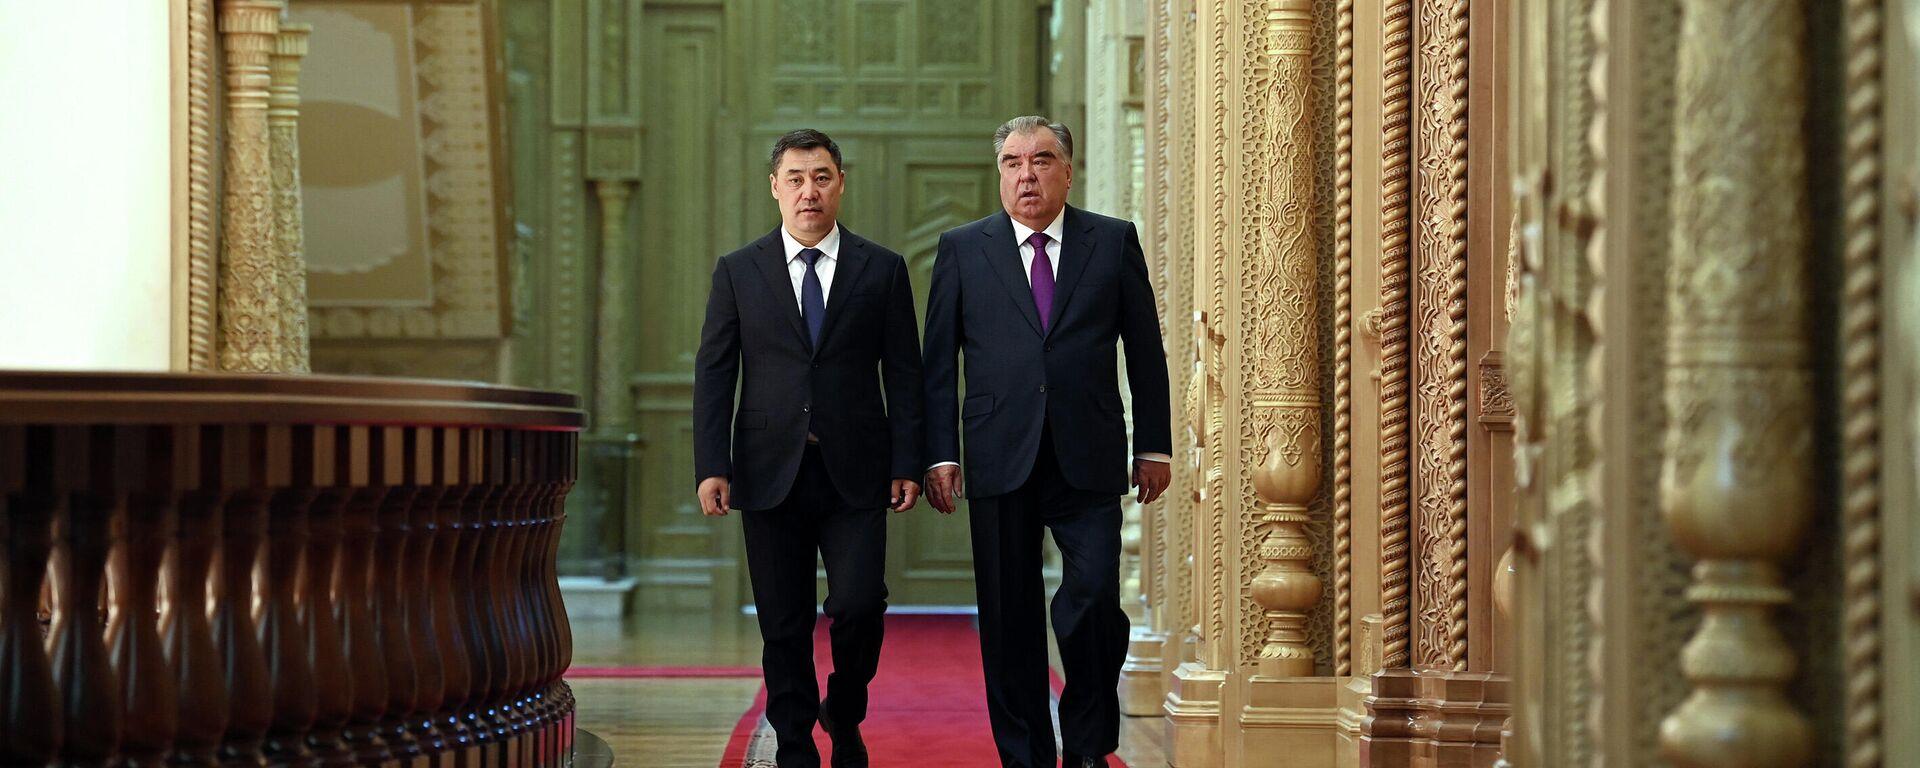 Встреча президента Таджикистана Эмомали Рахмона и президента Кыргызстана Садыр Жапаров - Sputnik Таджикистан, 1920, 29.06.2021